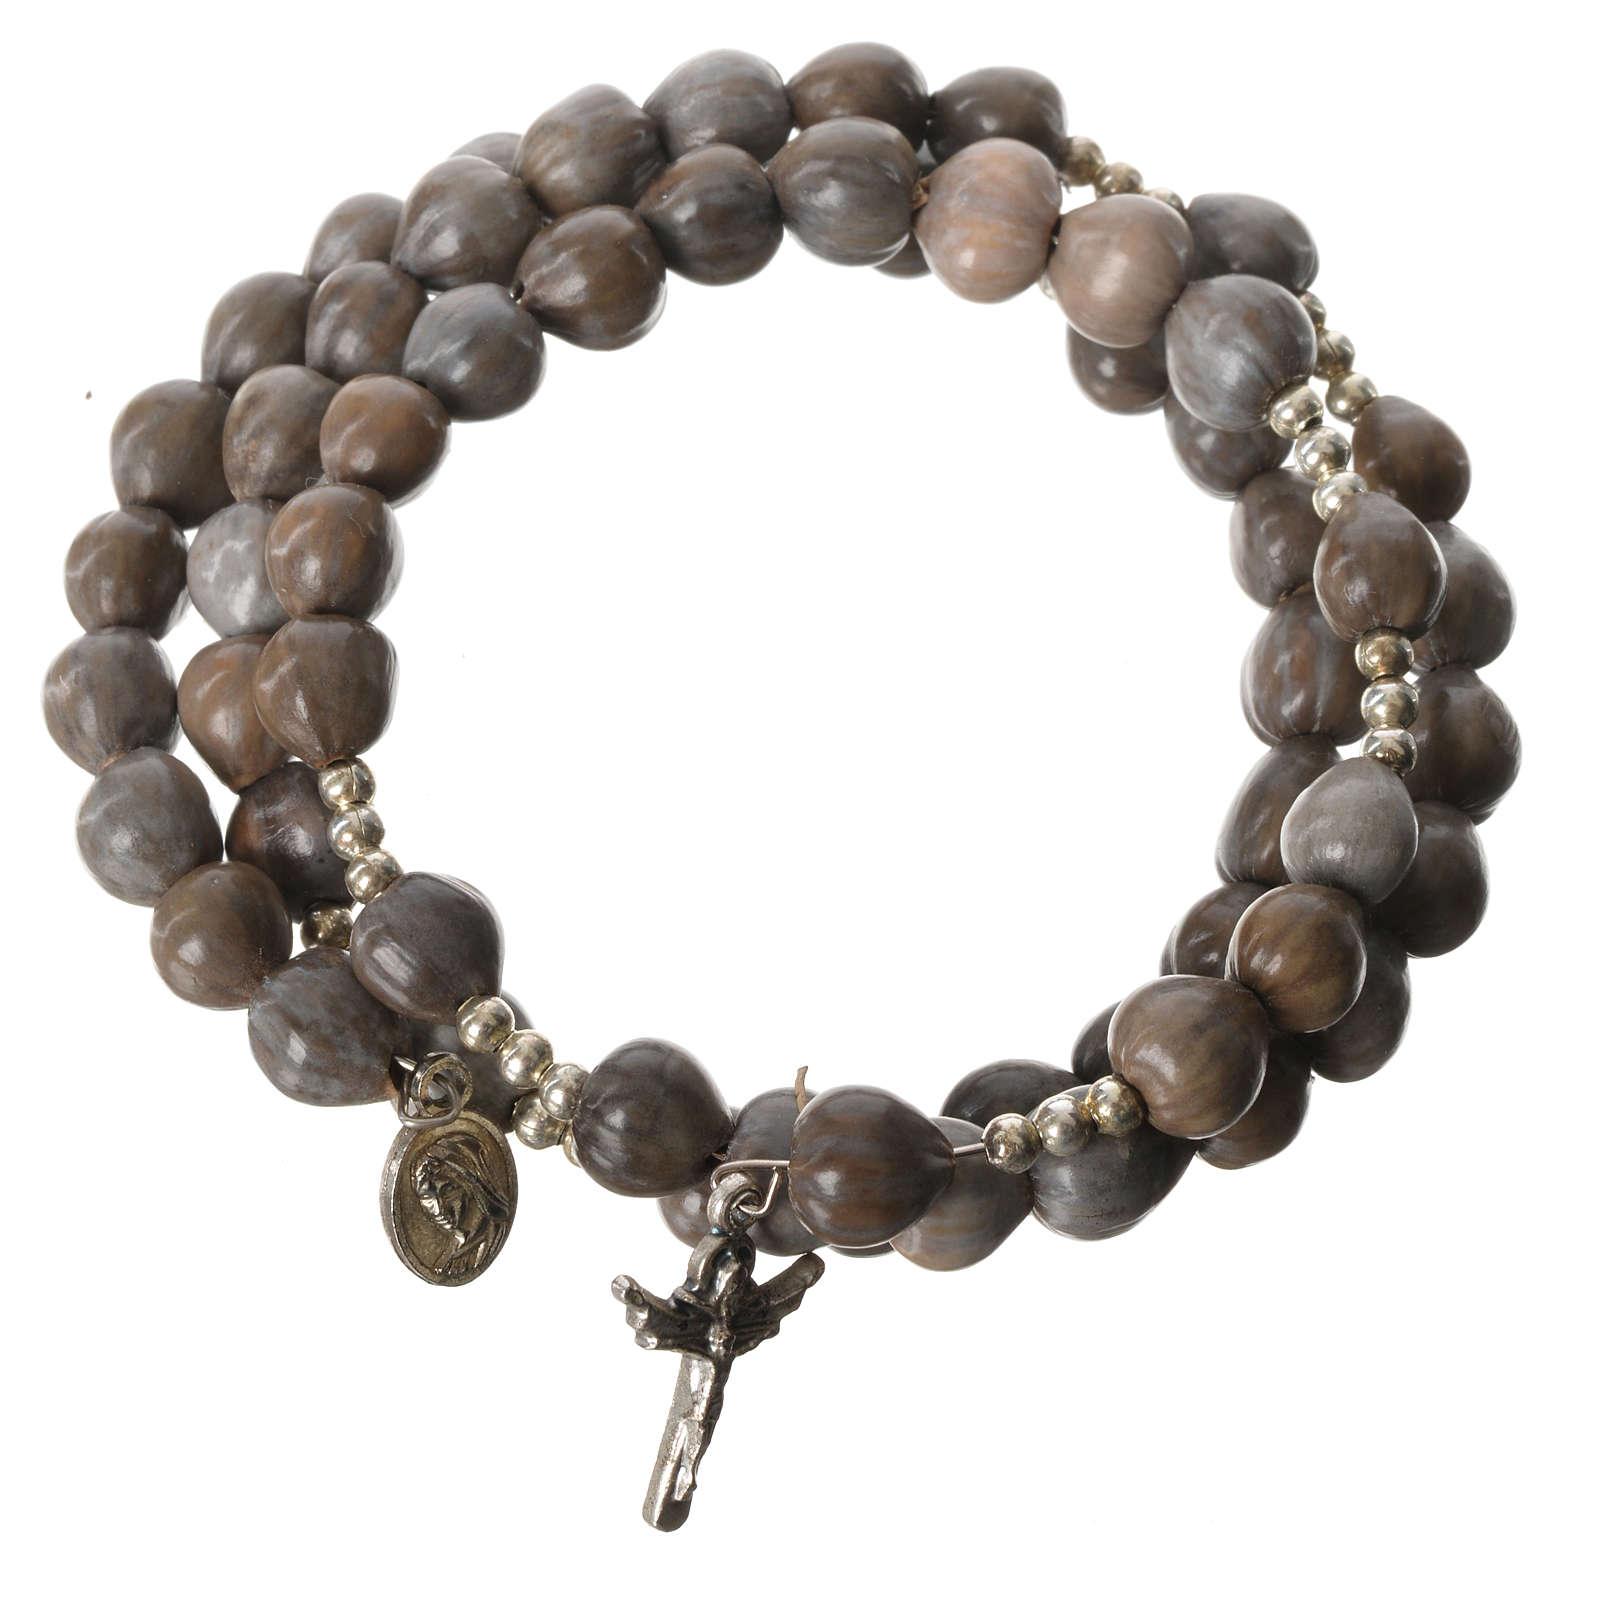 Elastic Medjugorje bracelet with Job's-tears 4